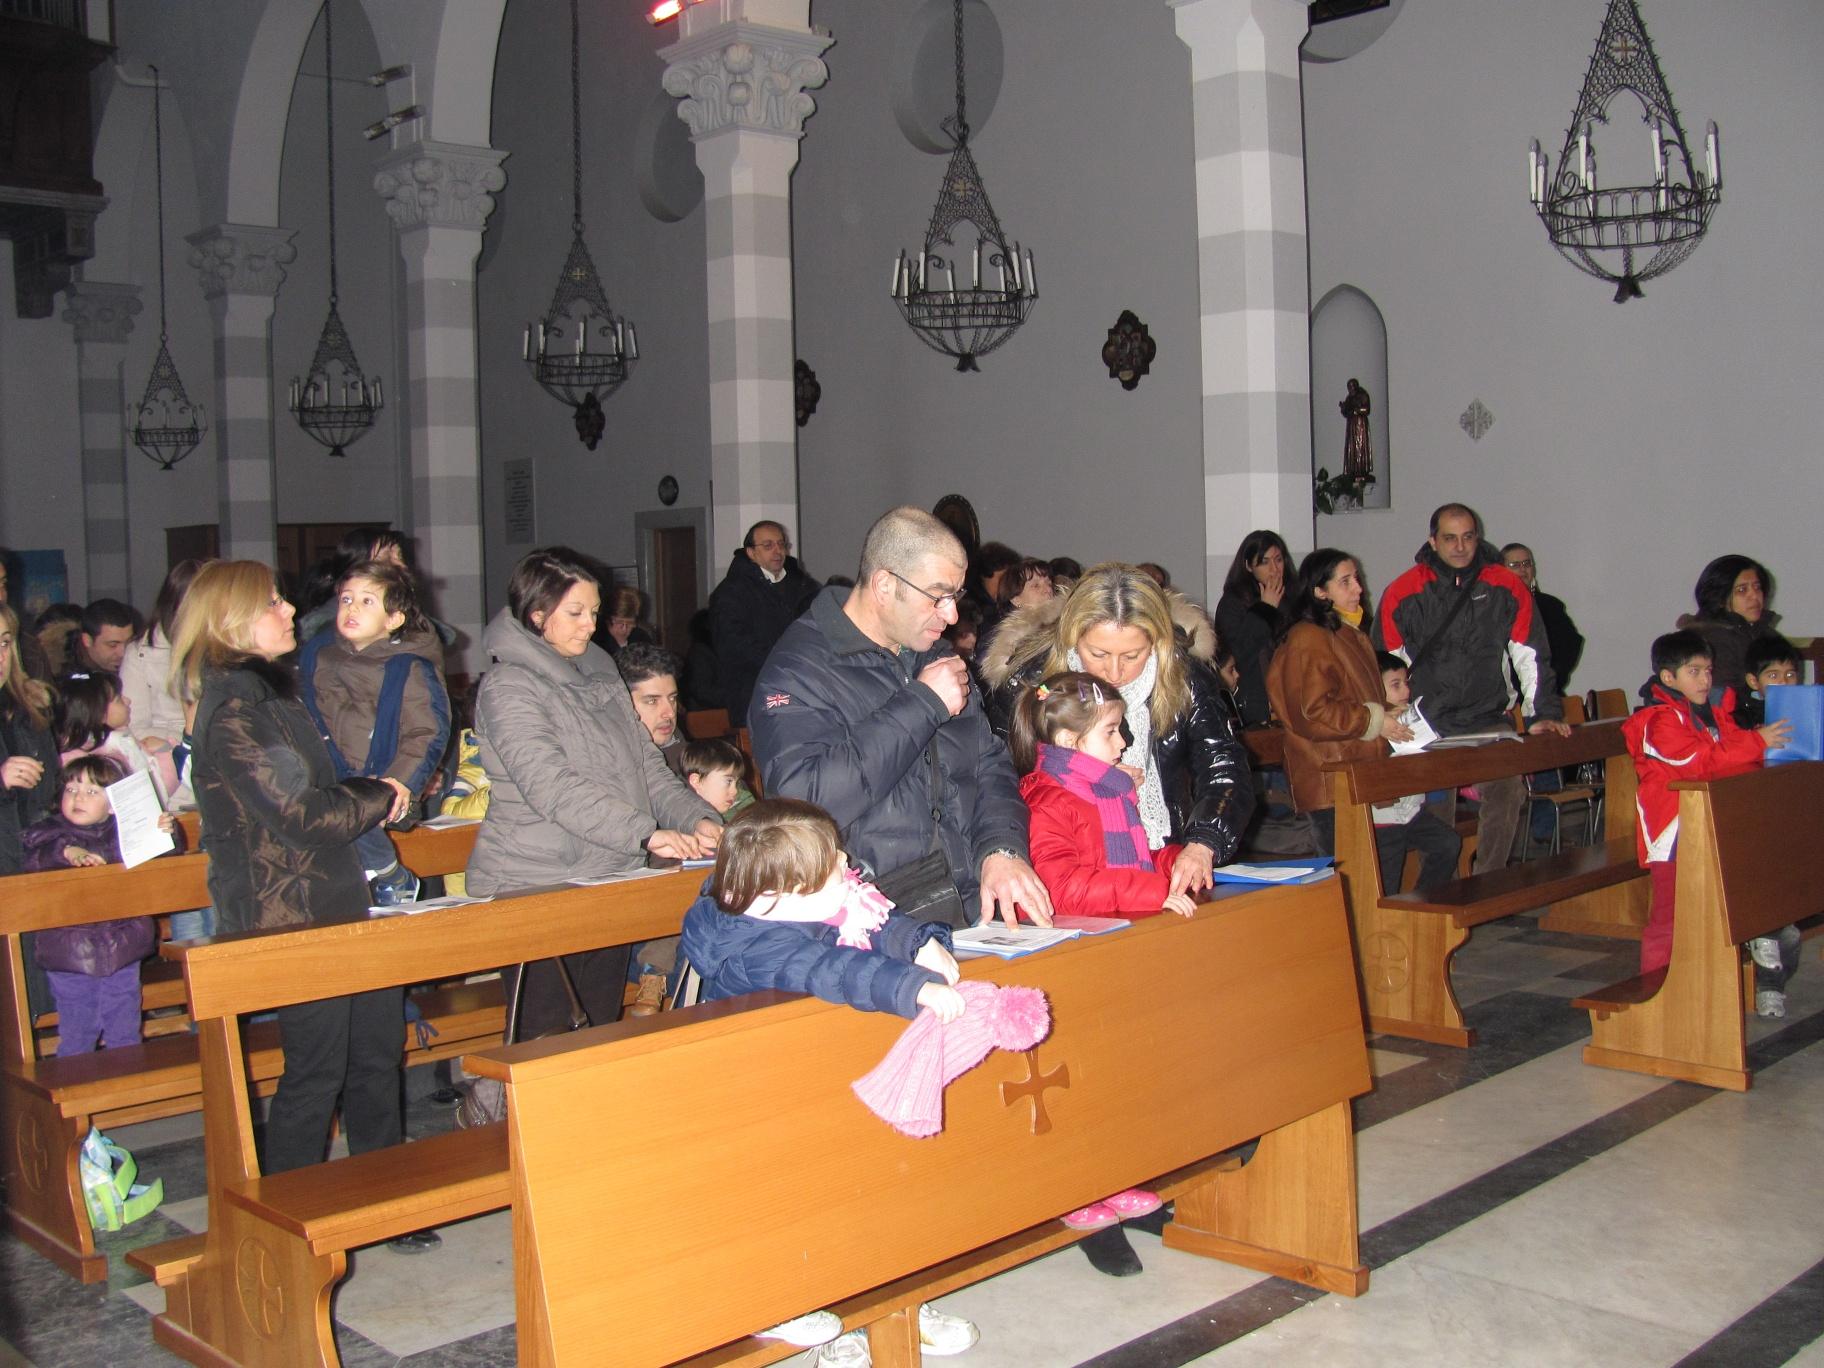 ricordo_battesimo_gesu_2011-01-23-16-21-33